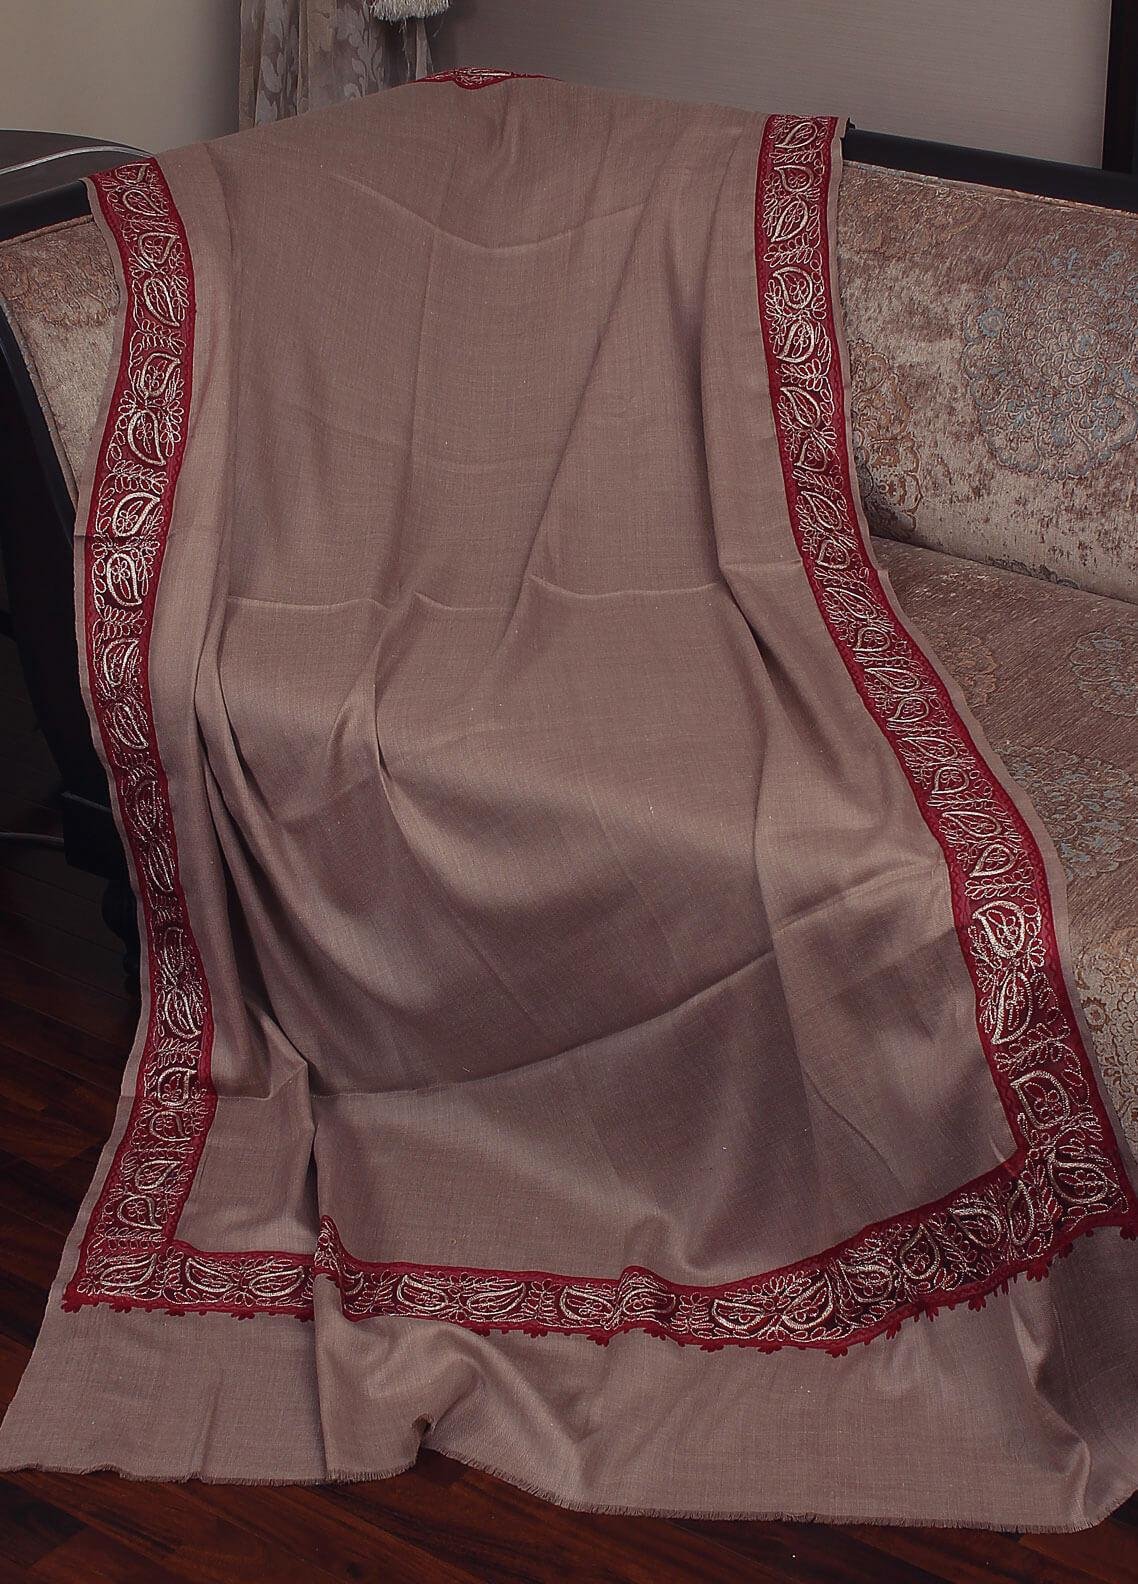 Sanaulla Exclusive Range Cut Work Embroidered Pashmina  Shawl 19-MIR-368 Brown - Kashmiri Shawls